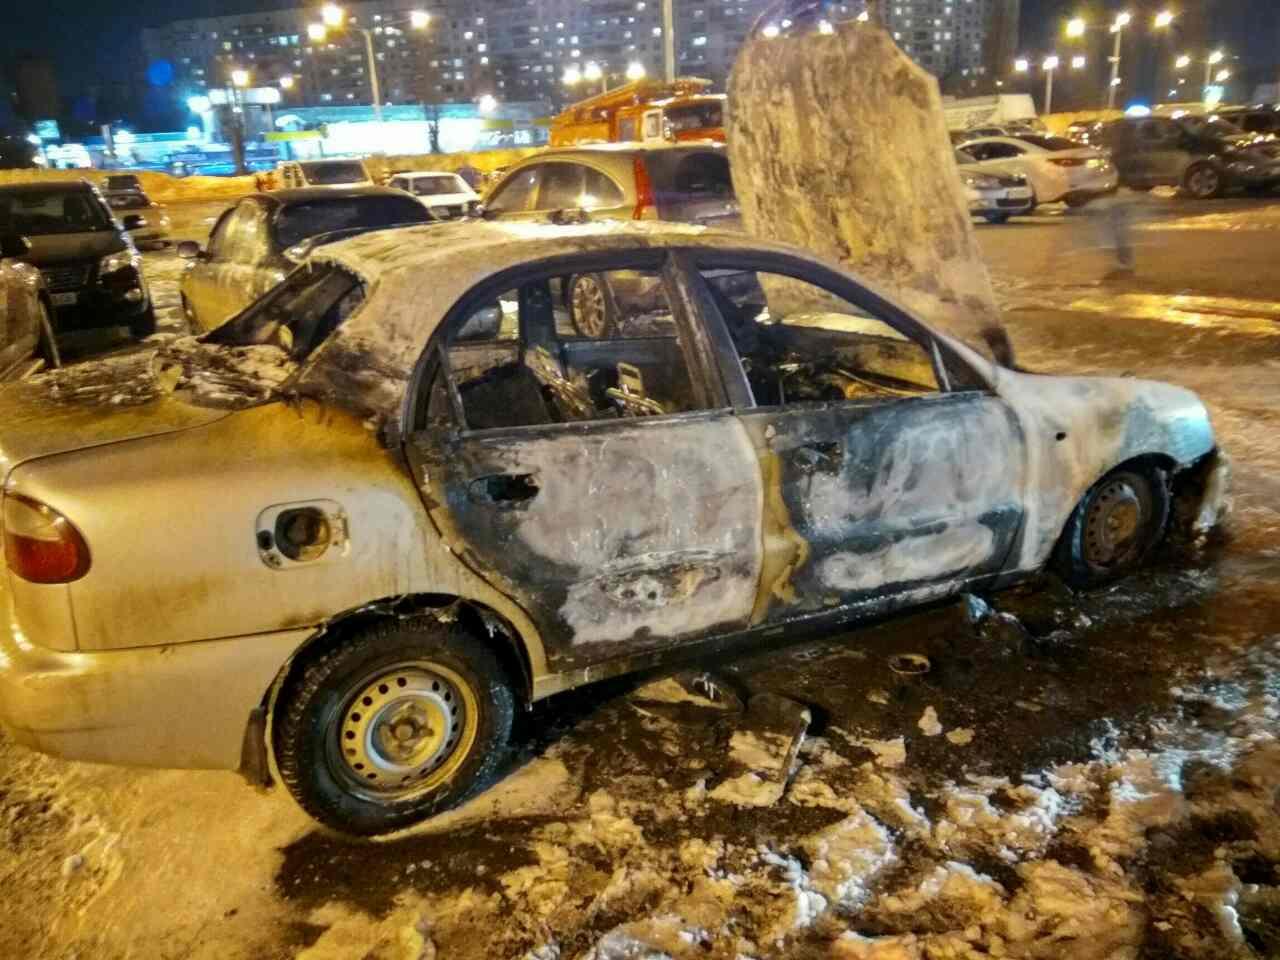 На глазах у десятков харьковчан взорвалась машина такси (ФОТО, ВИДЕО)